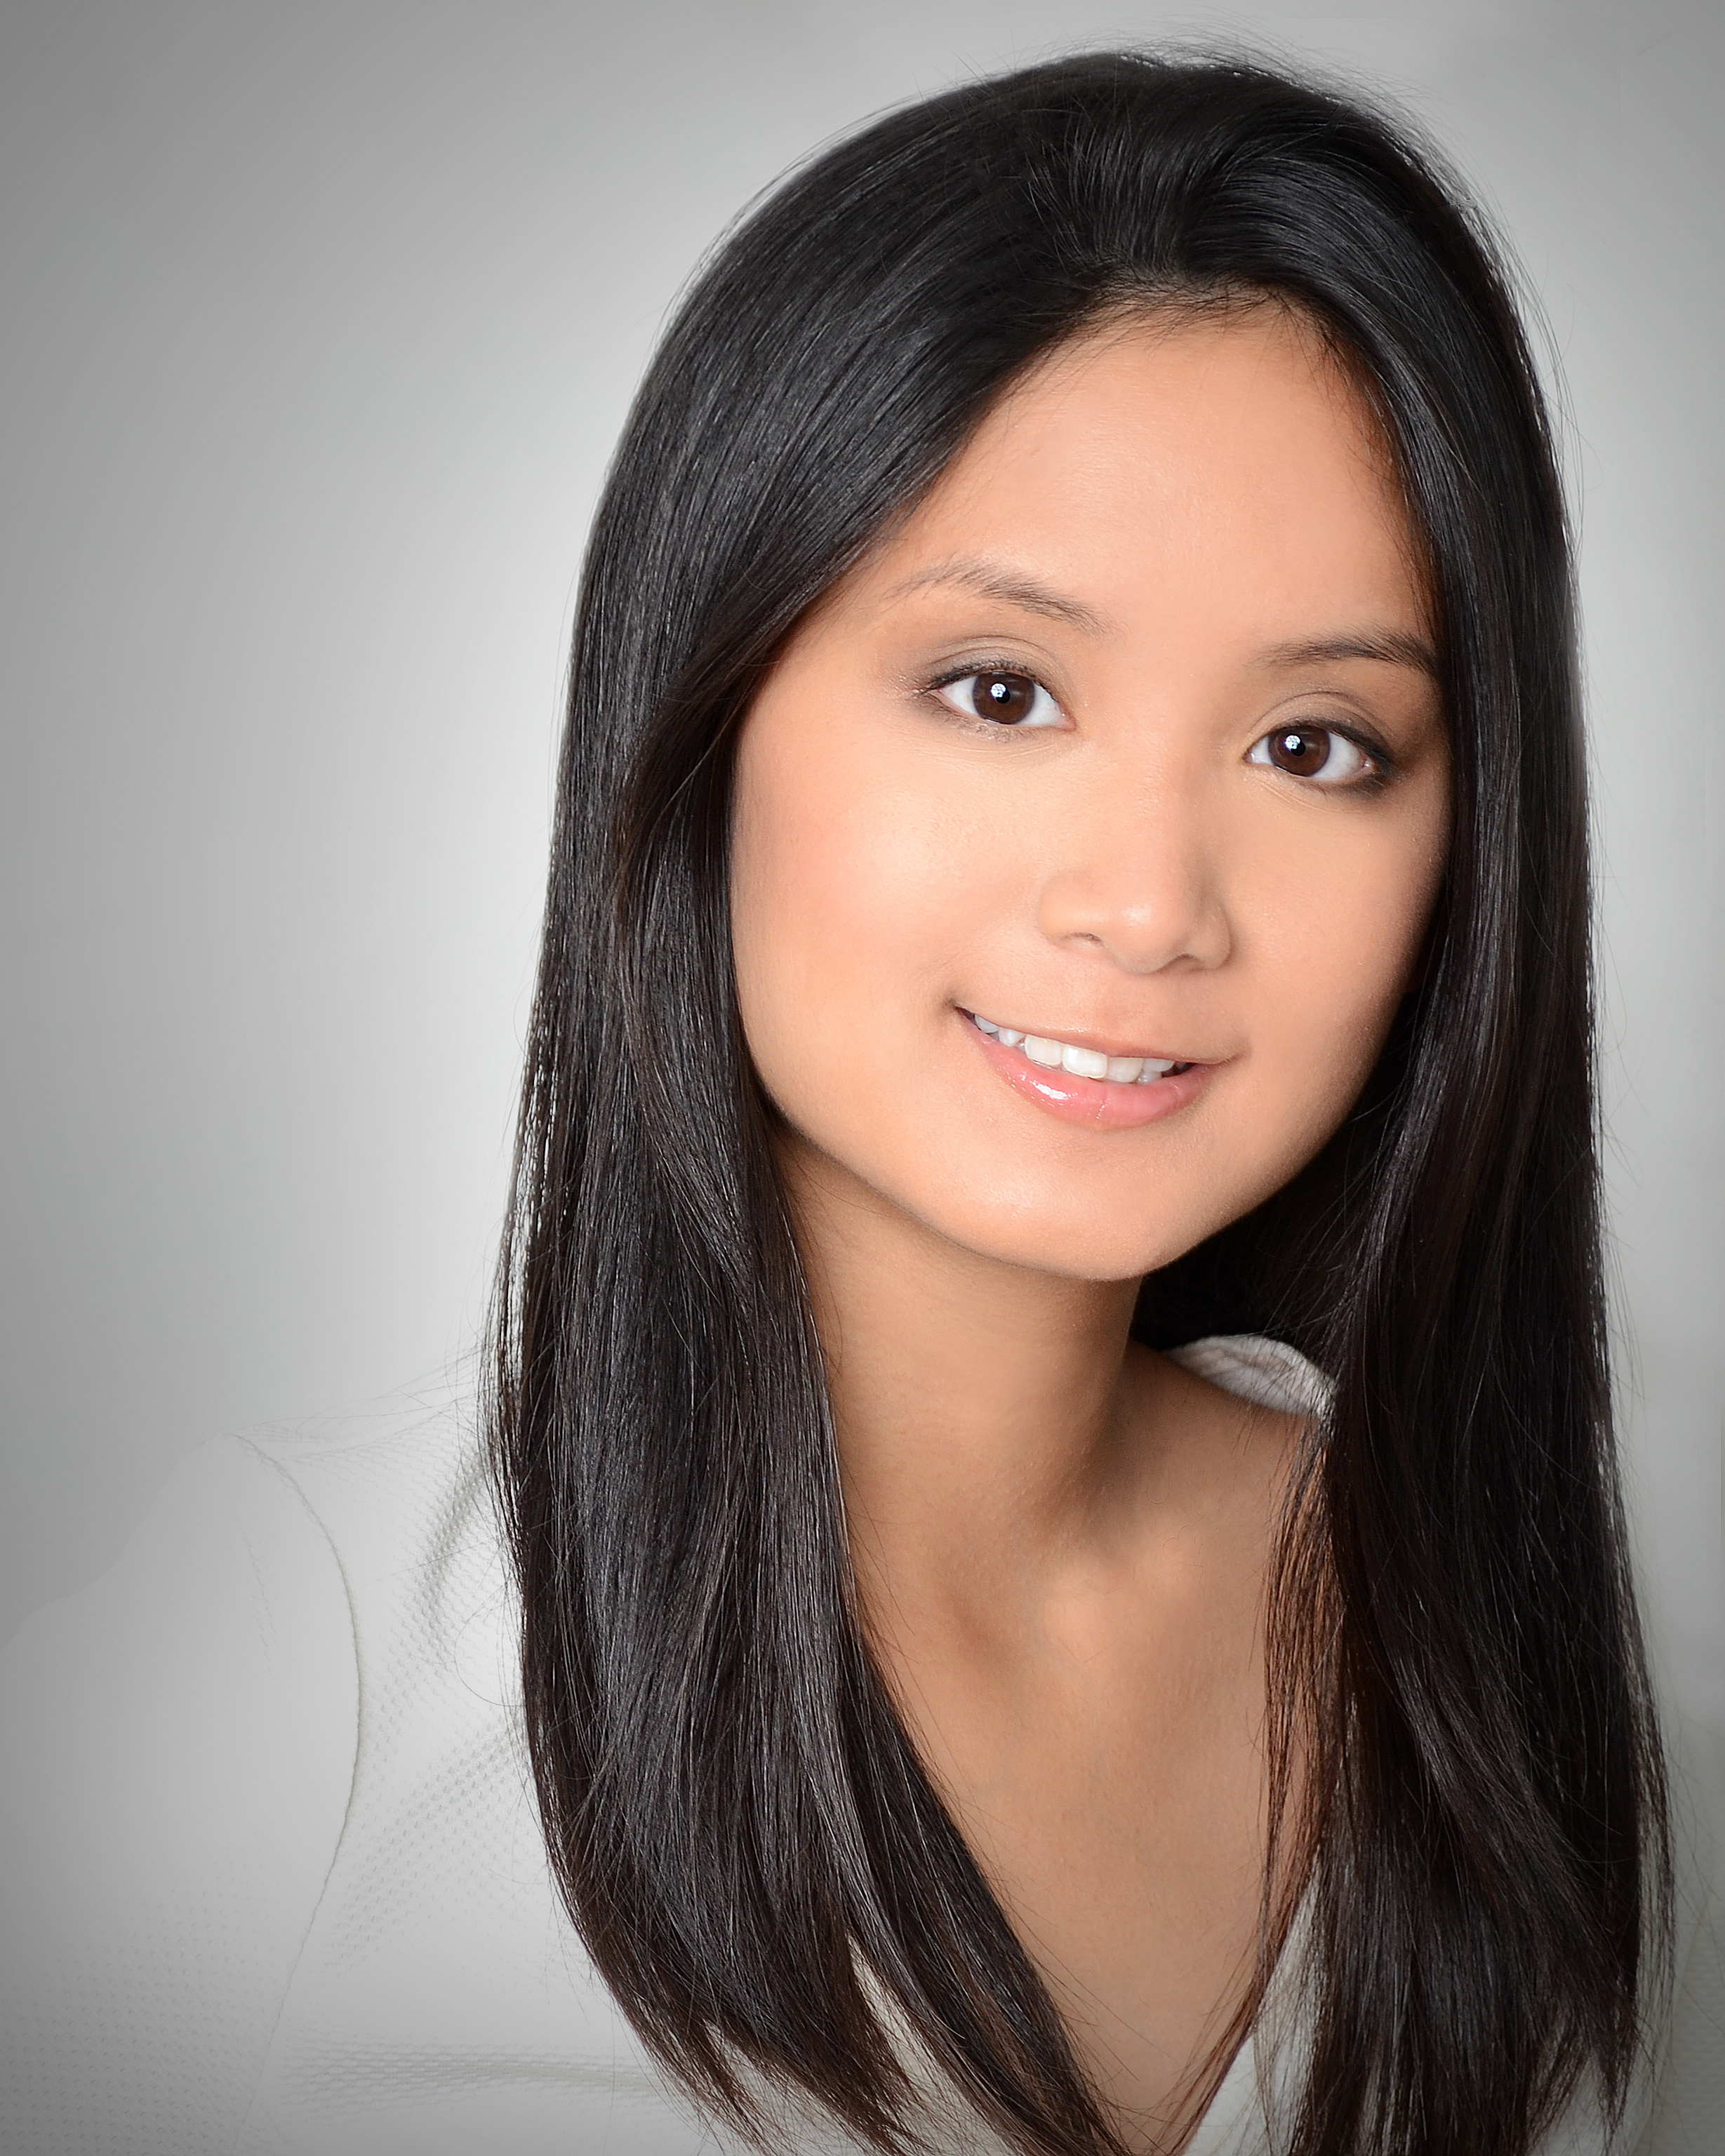 Maddie Bautista Headshot.jpg